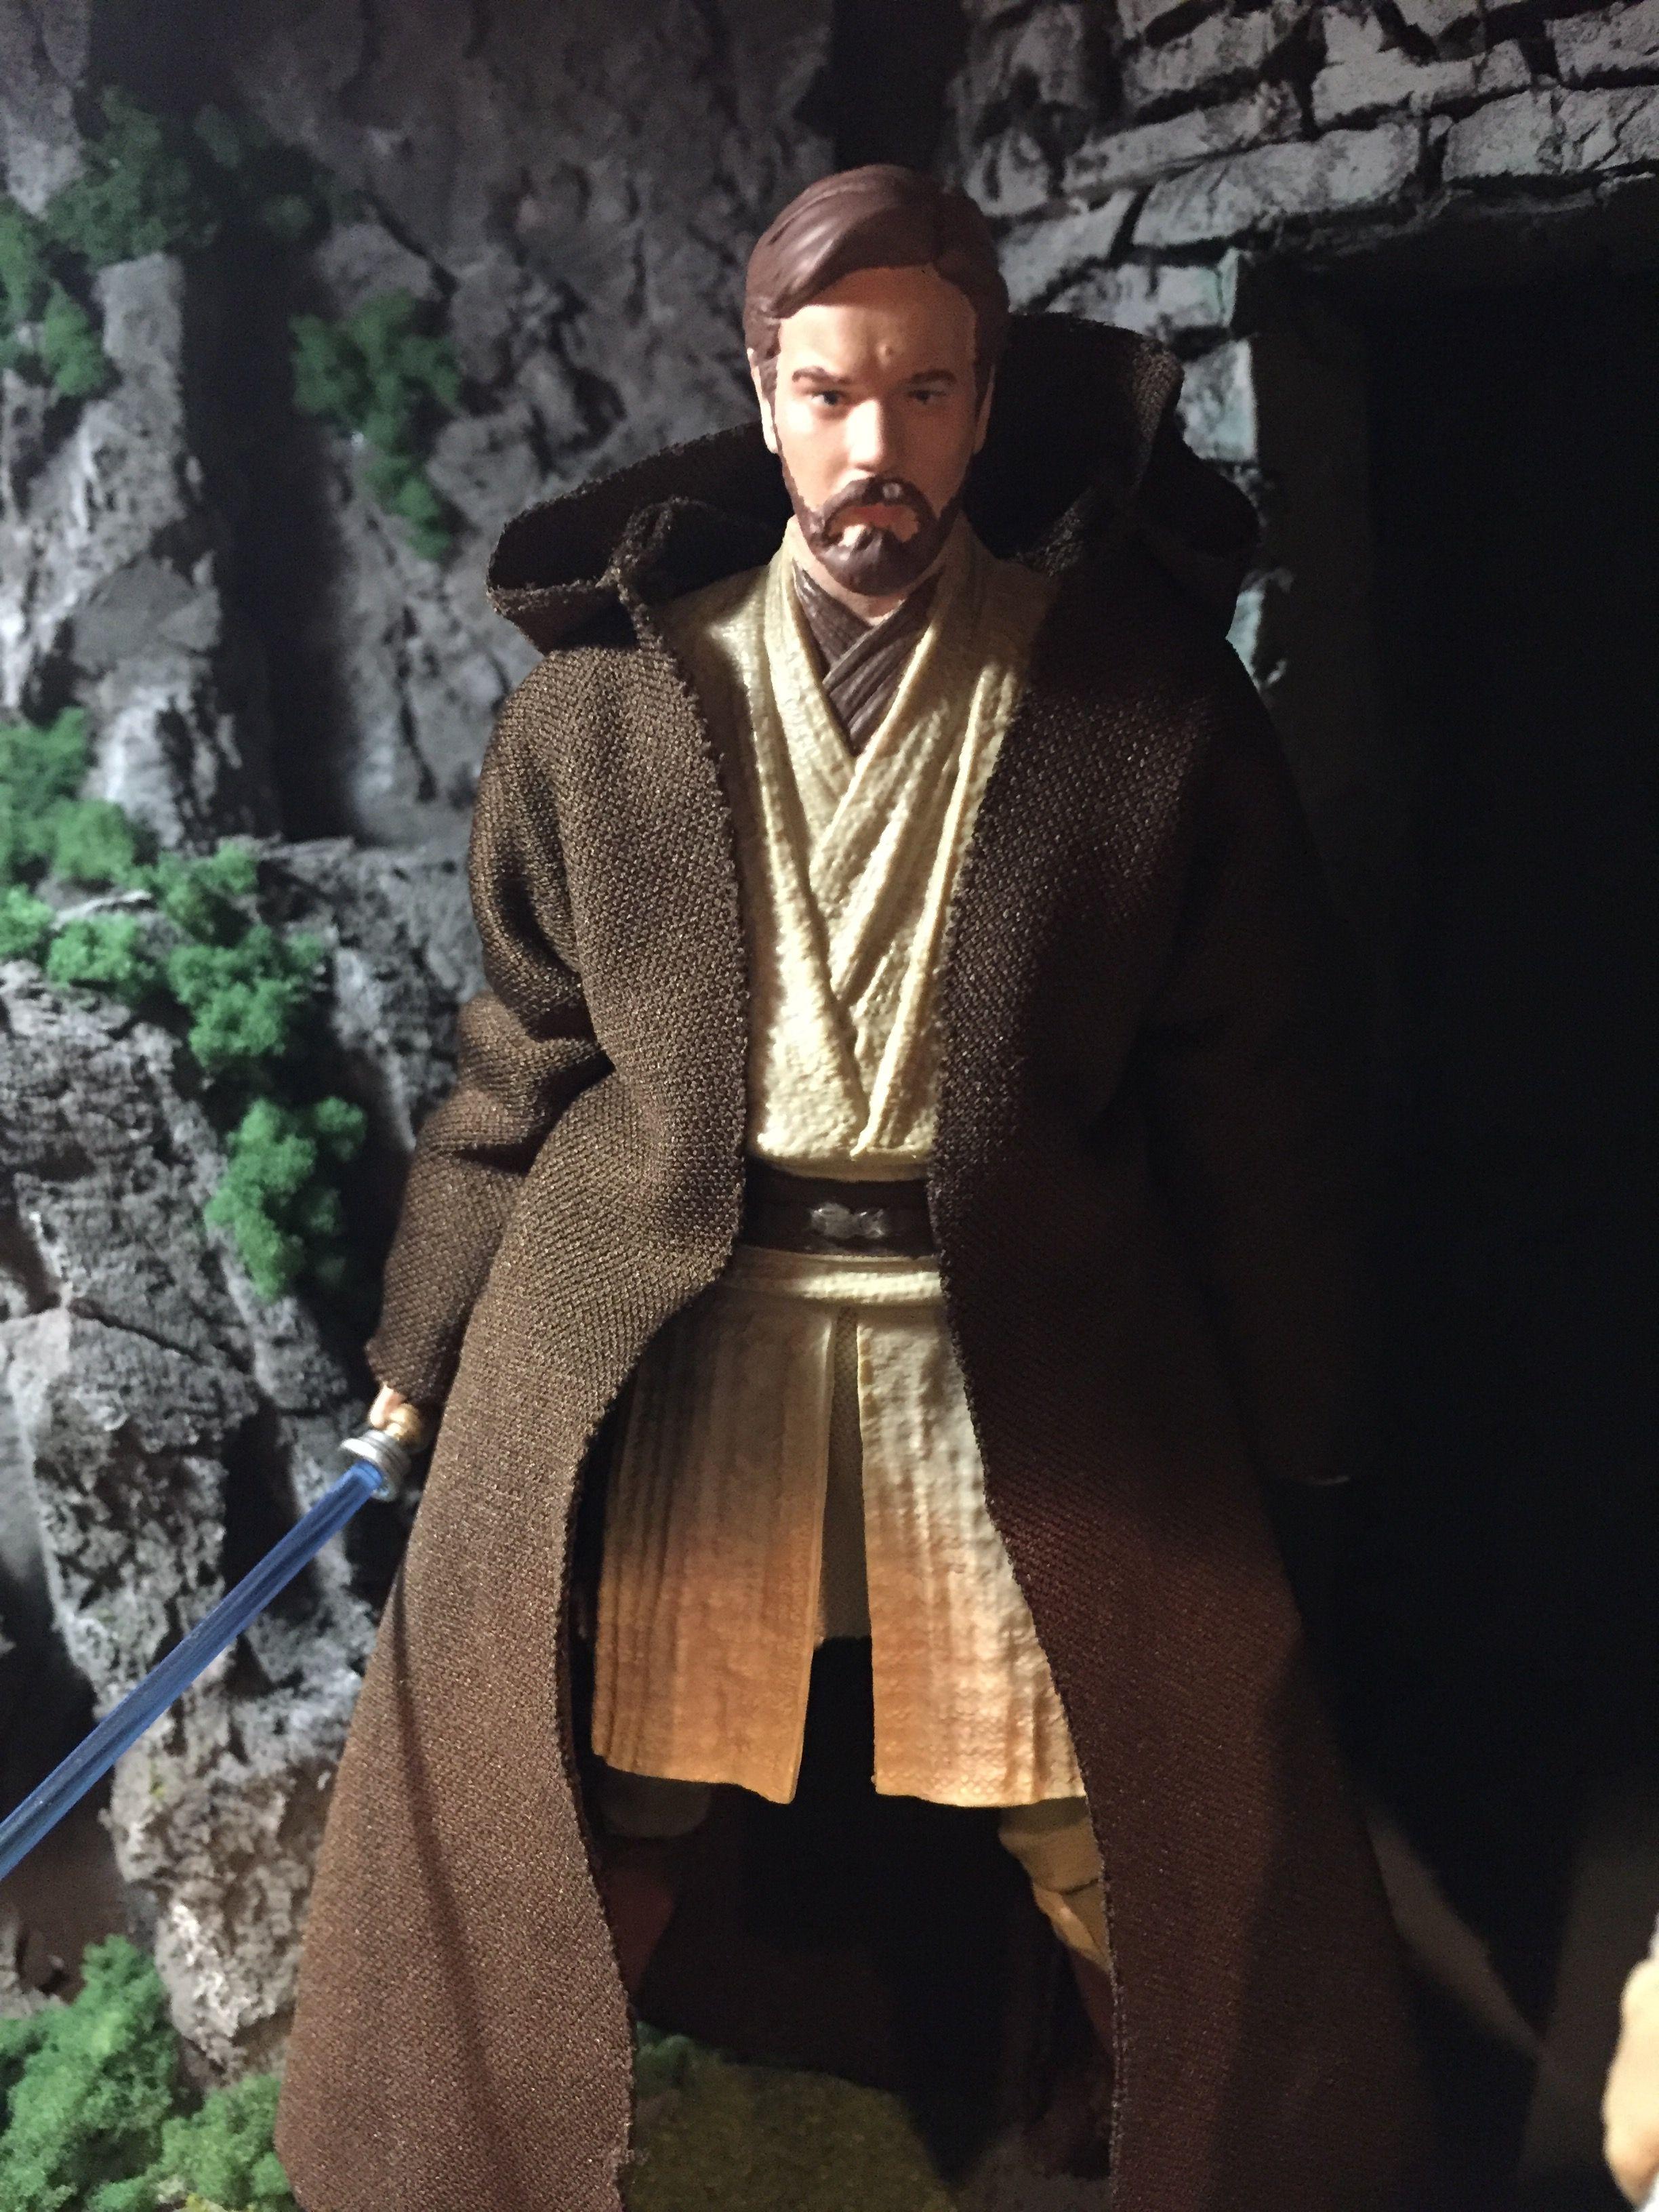 Obi Wan Kenobi Star Wars Black Series 6 Inch Custom Repaint Action Figure Star Wars Black Series Star Wars Toys Star Wars Action Figures